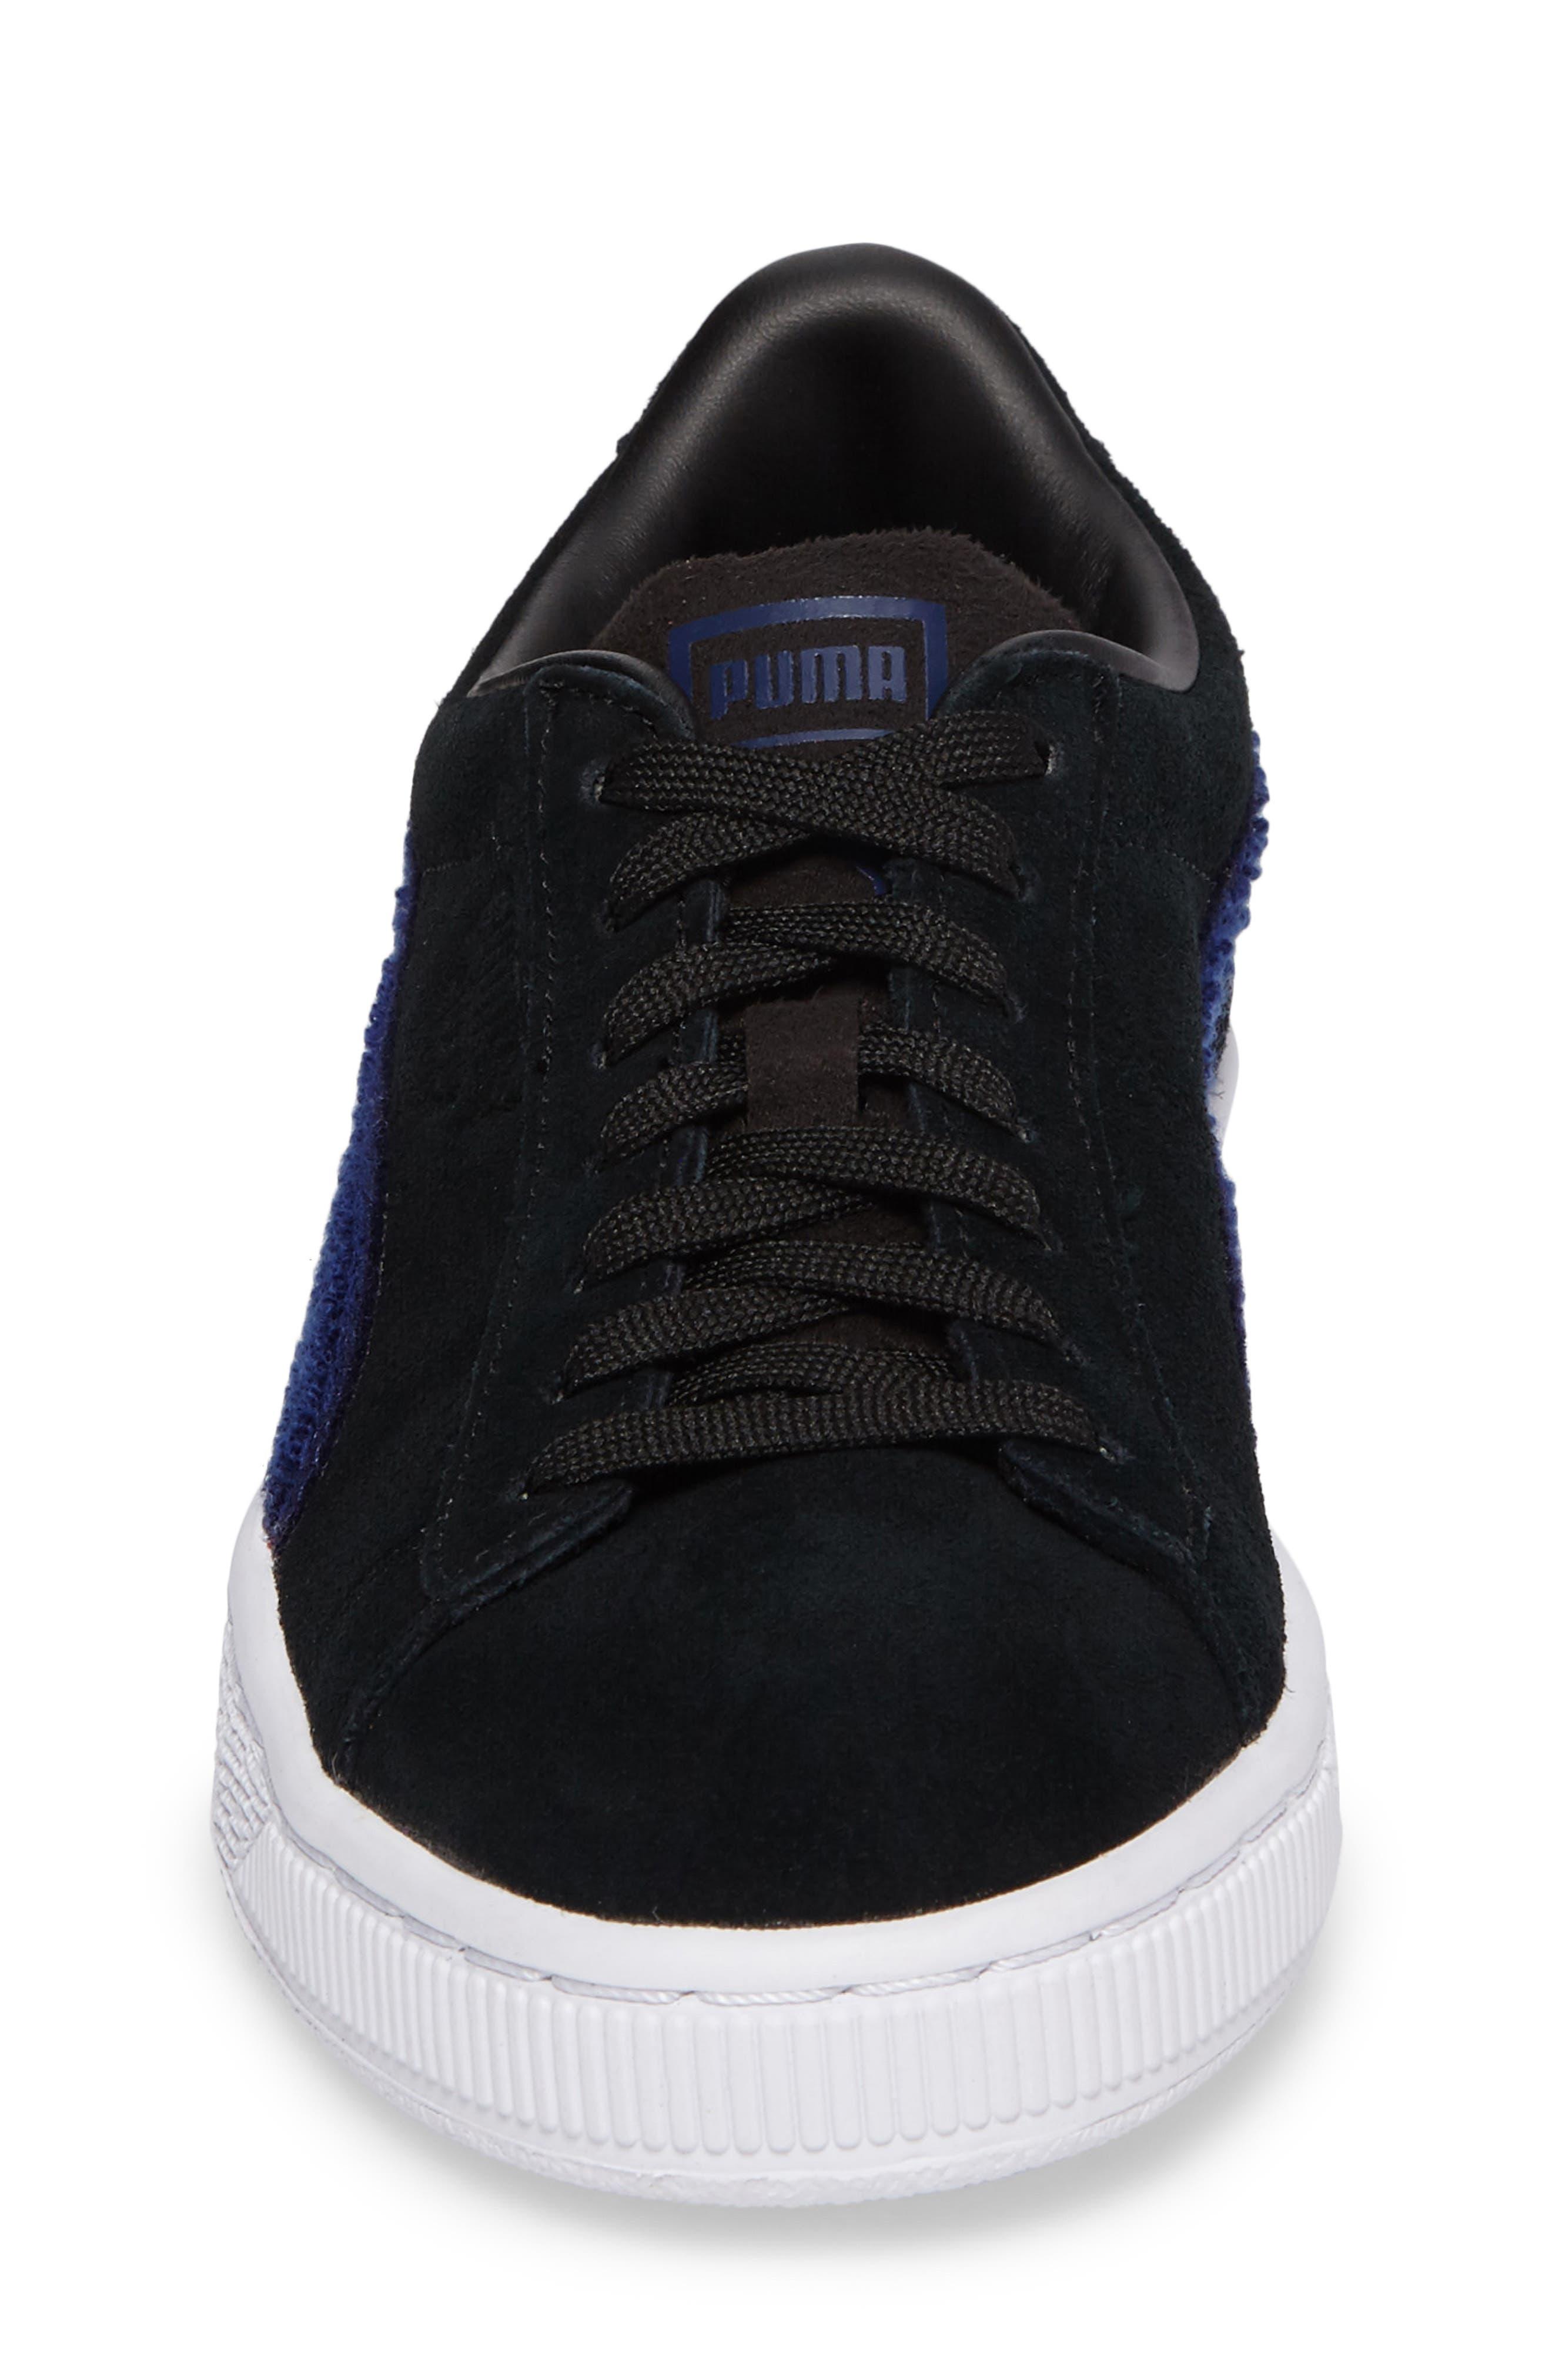 Classic Terry Jr Sneaker,                             Alternate thumbnail 4, color,                             001